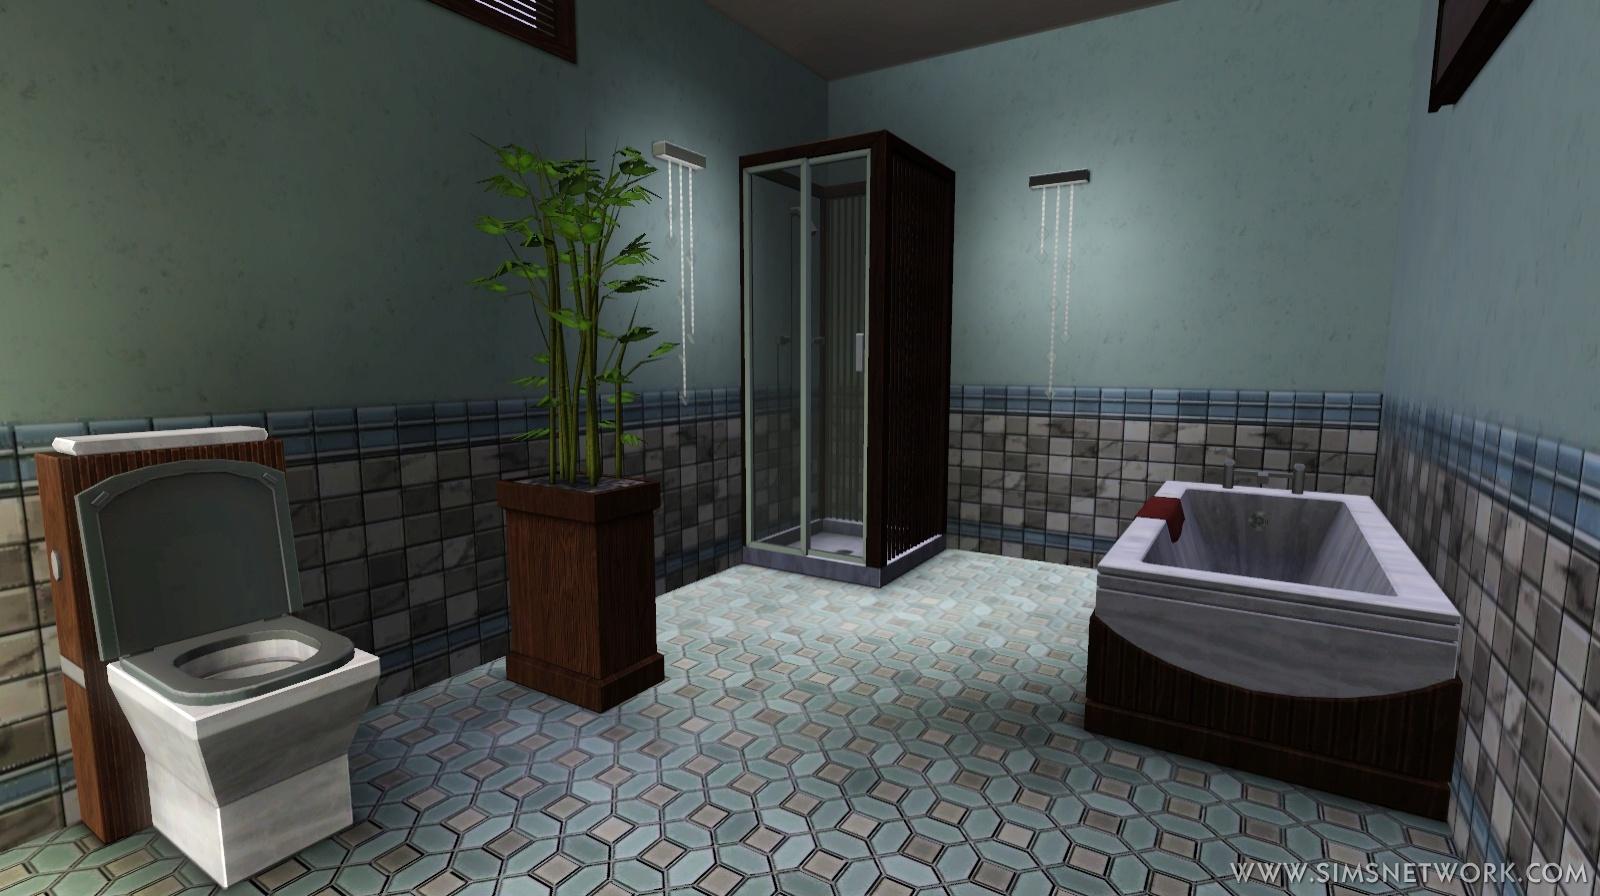 De Sims 3 - Slaap- en badkamer Accessoires Review | SNW ...